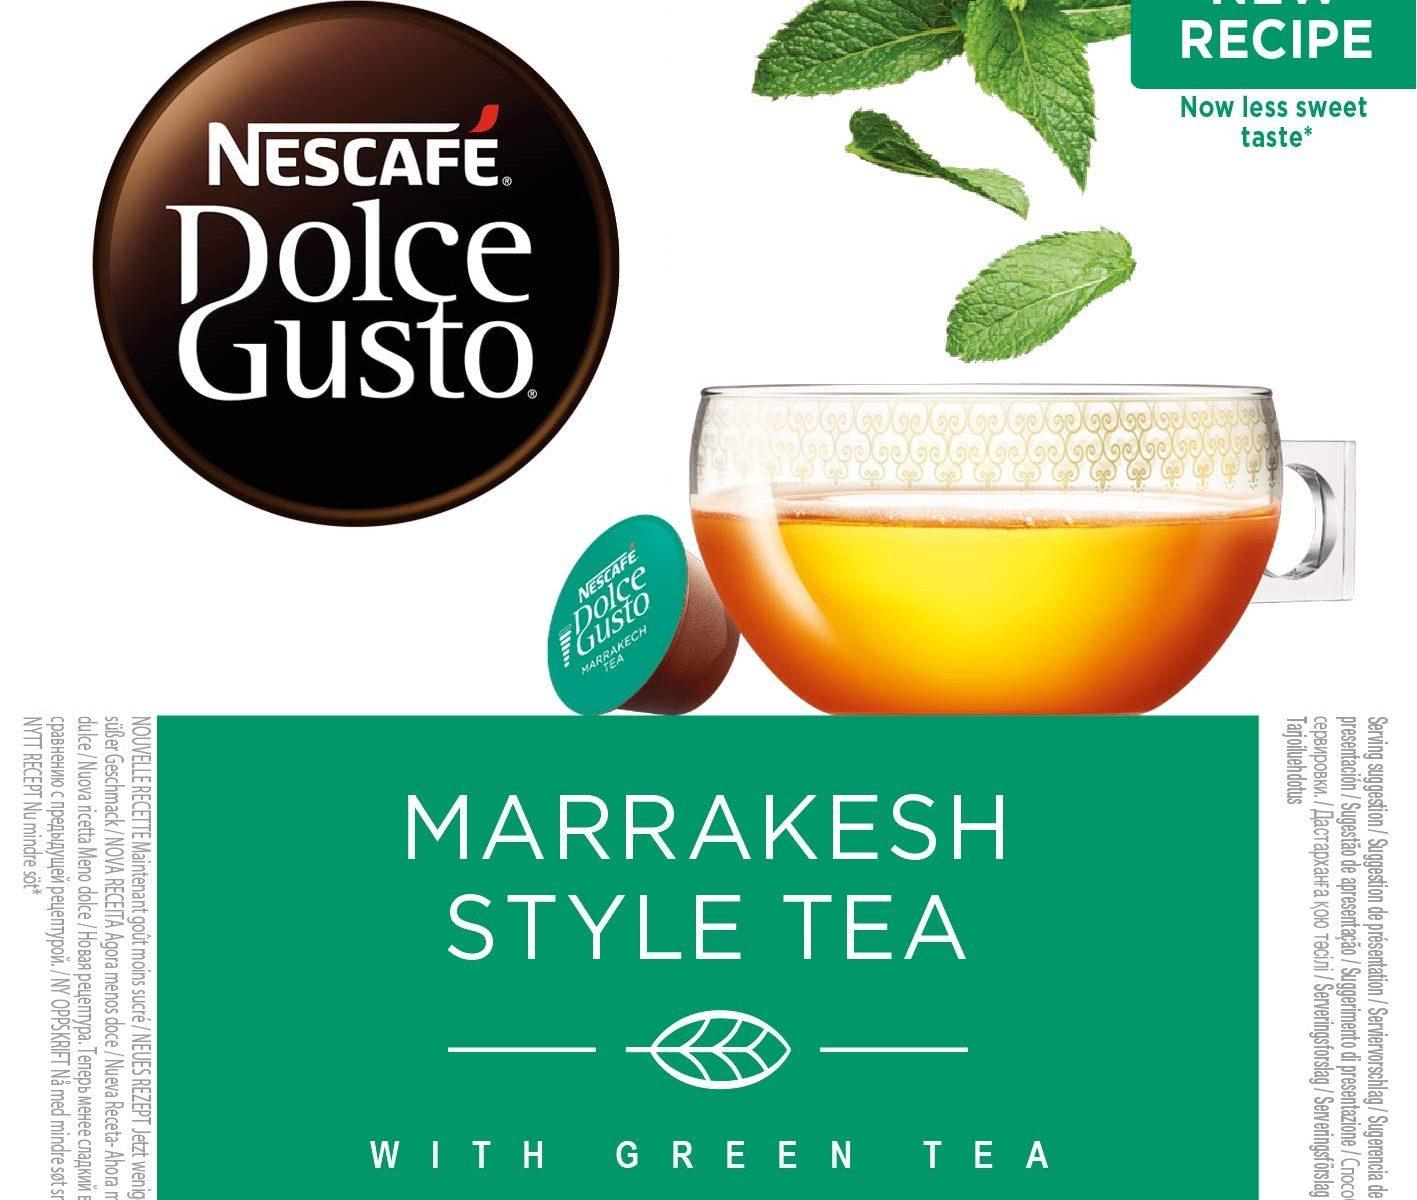 Nescafé DOLCE GUSTO té MARRAKESH Style Tea